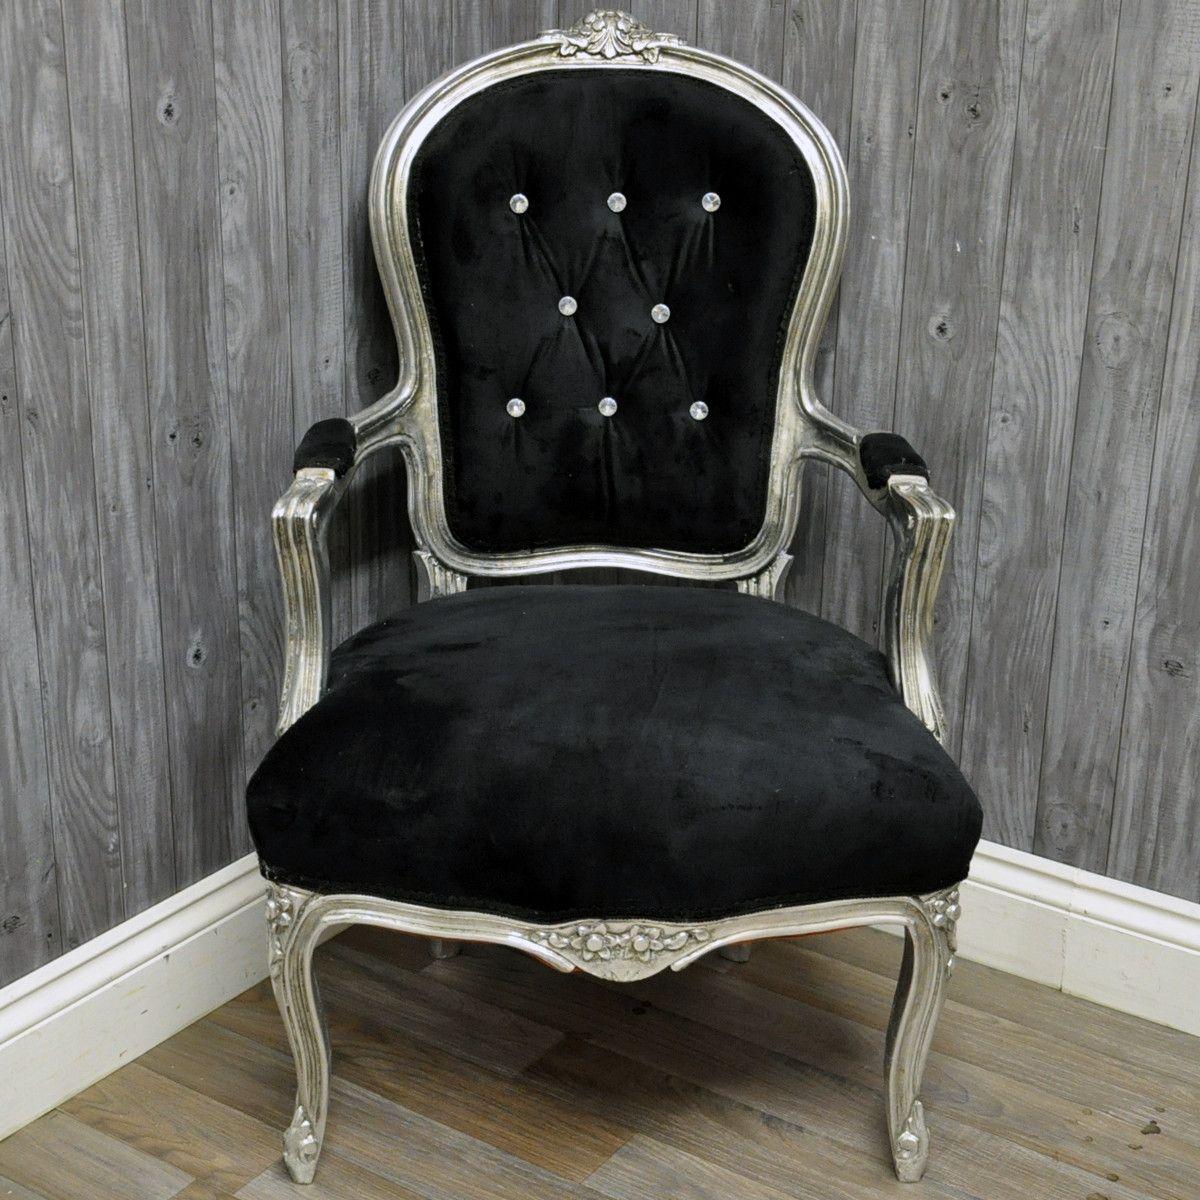 black velvet throne chair rocking cushion nursery bedroom shapeyourminds